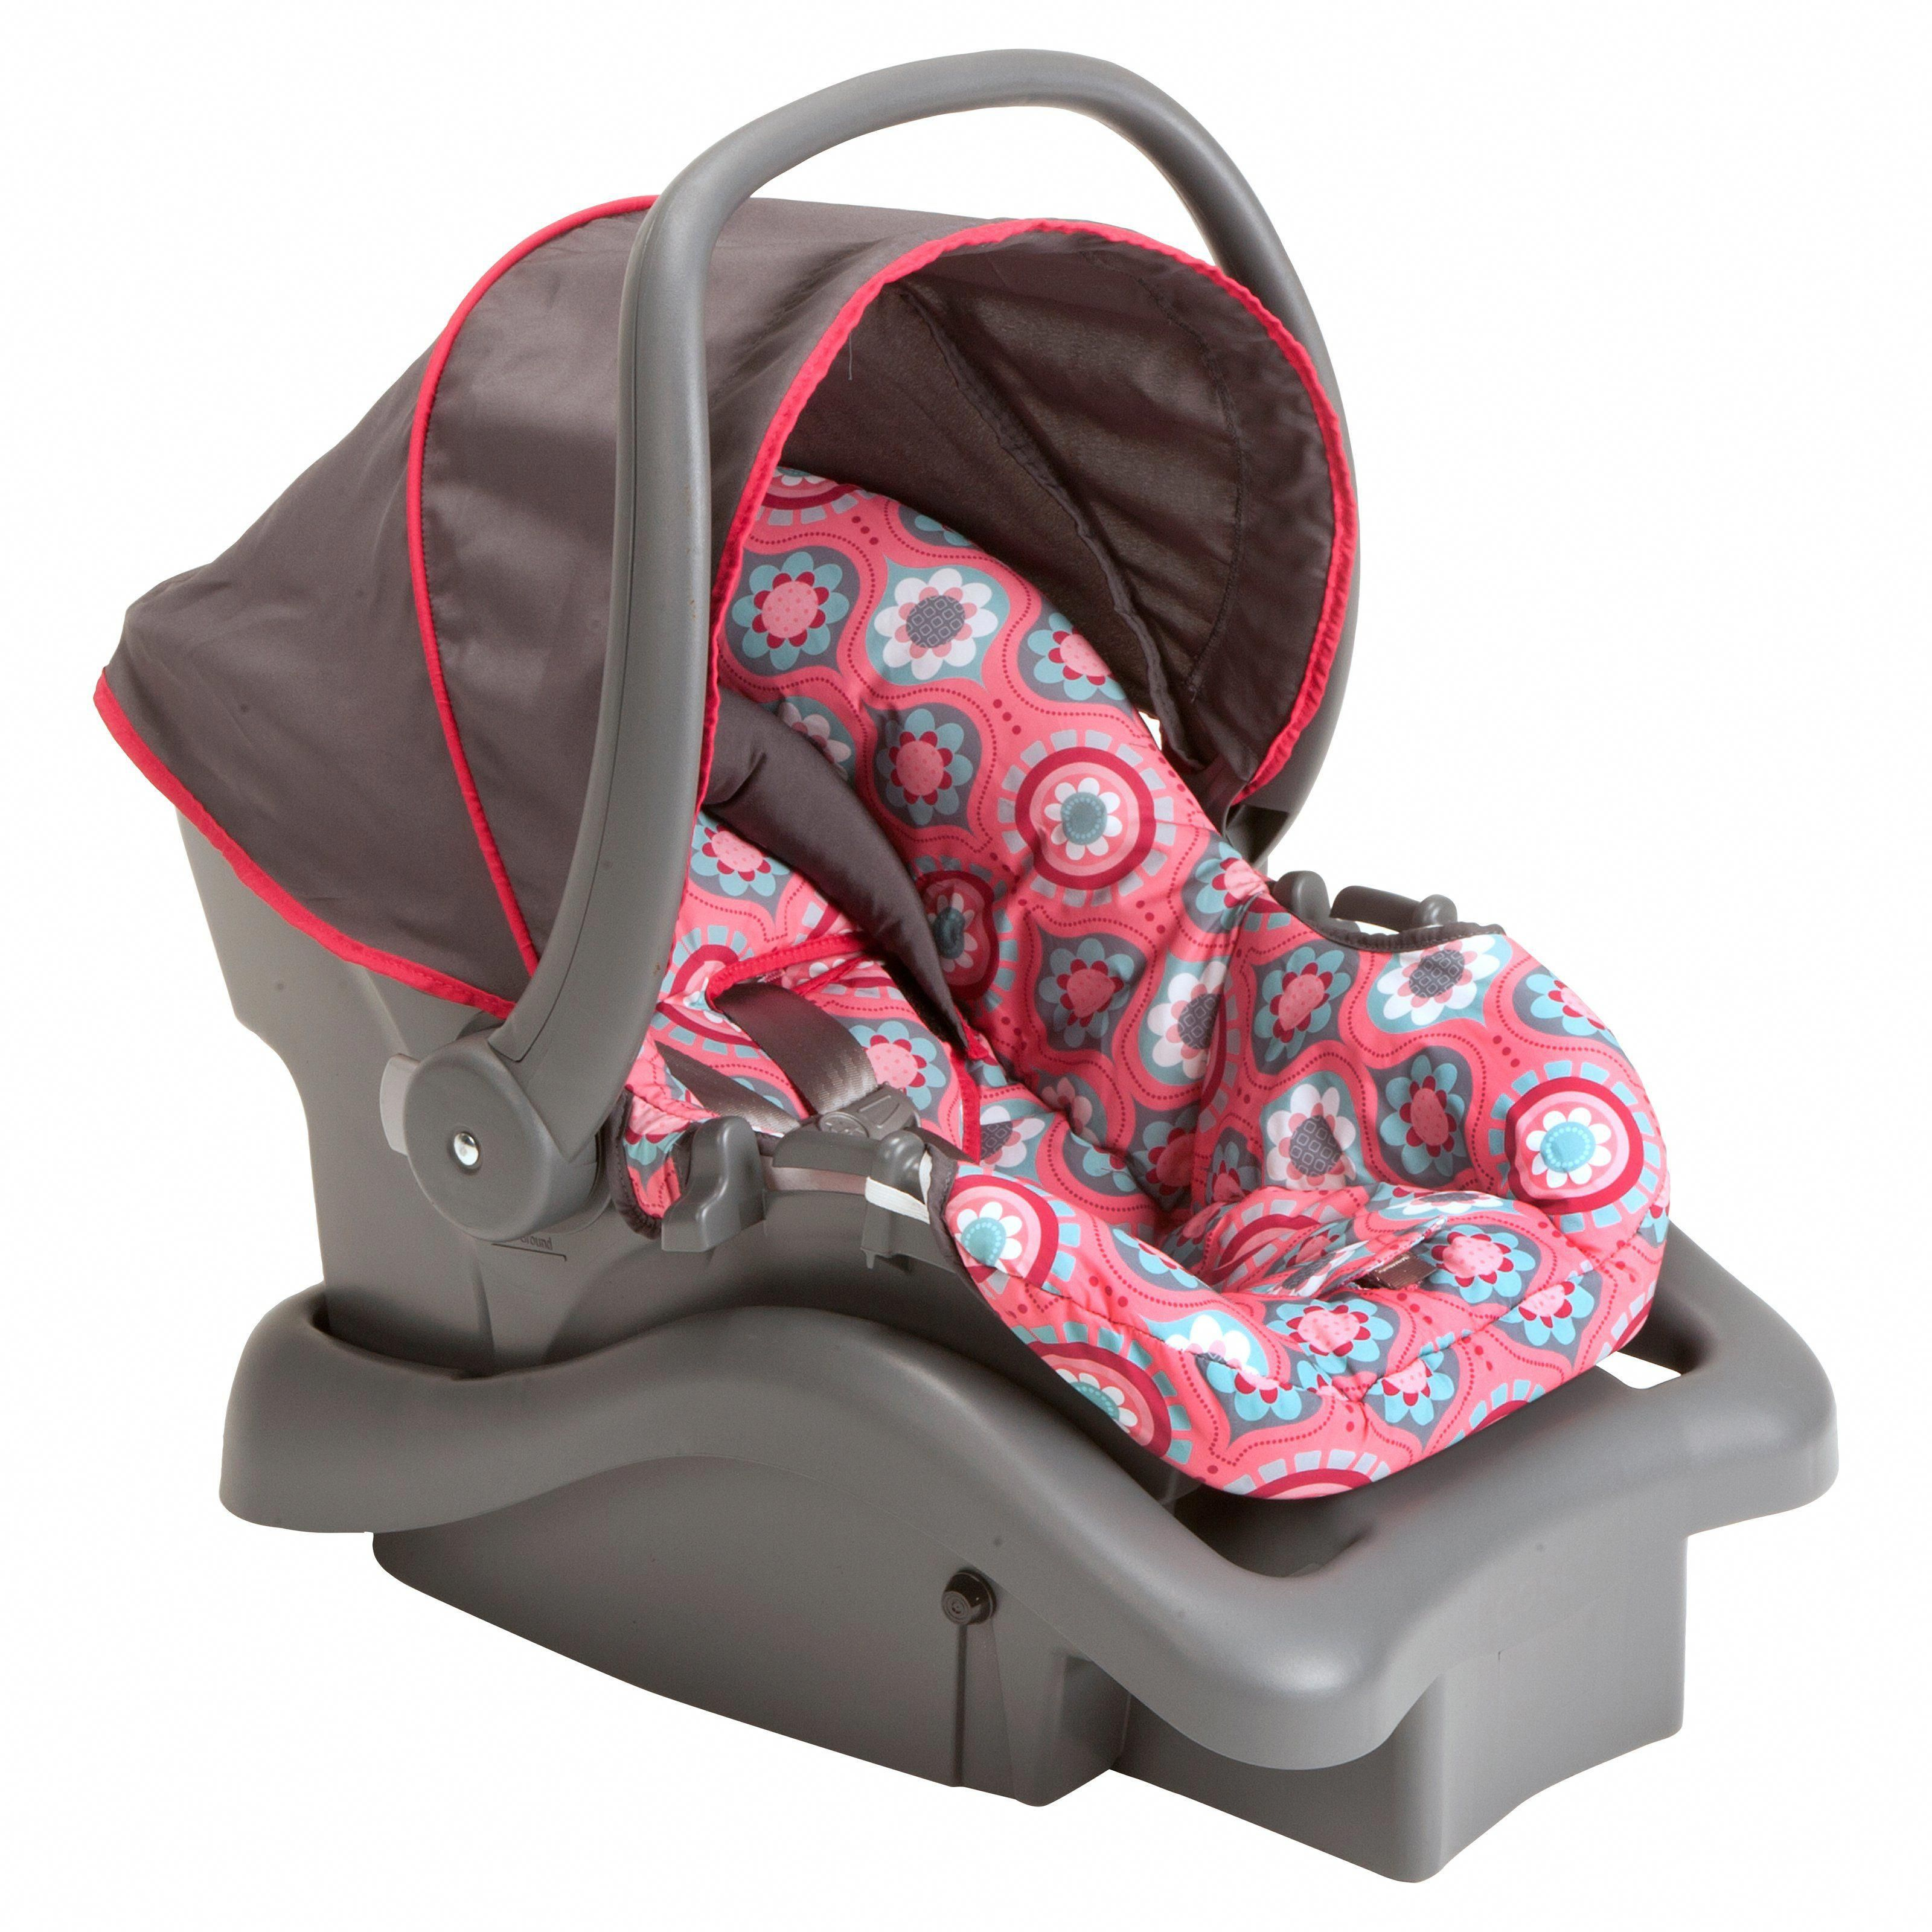 Cosco Light N Comfy DX Infant Car Seat Posey Pop